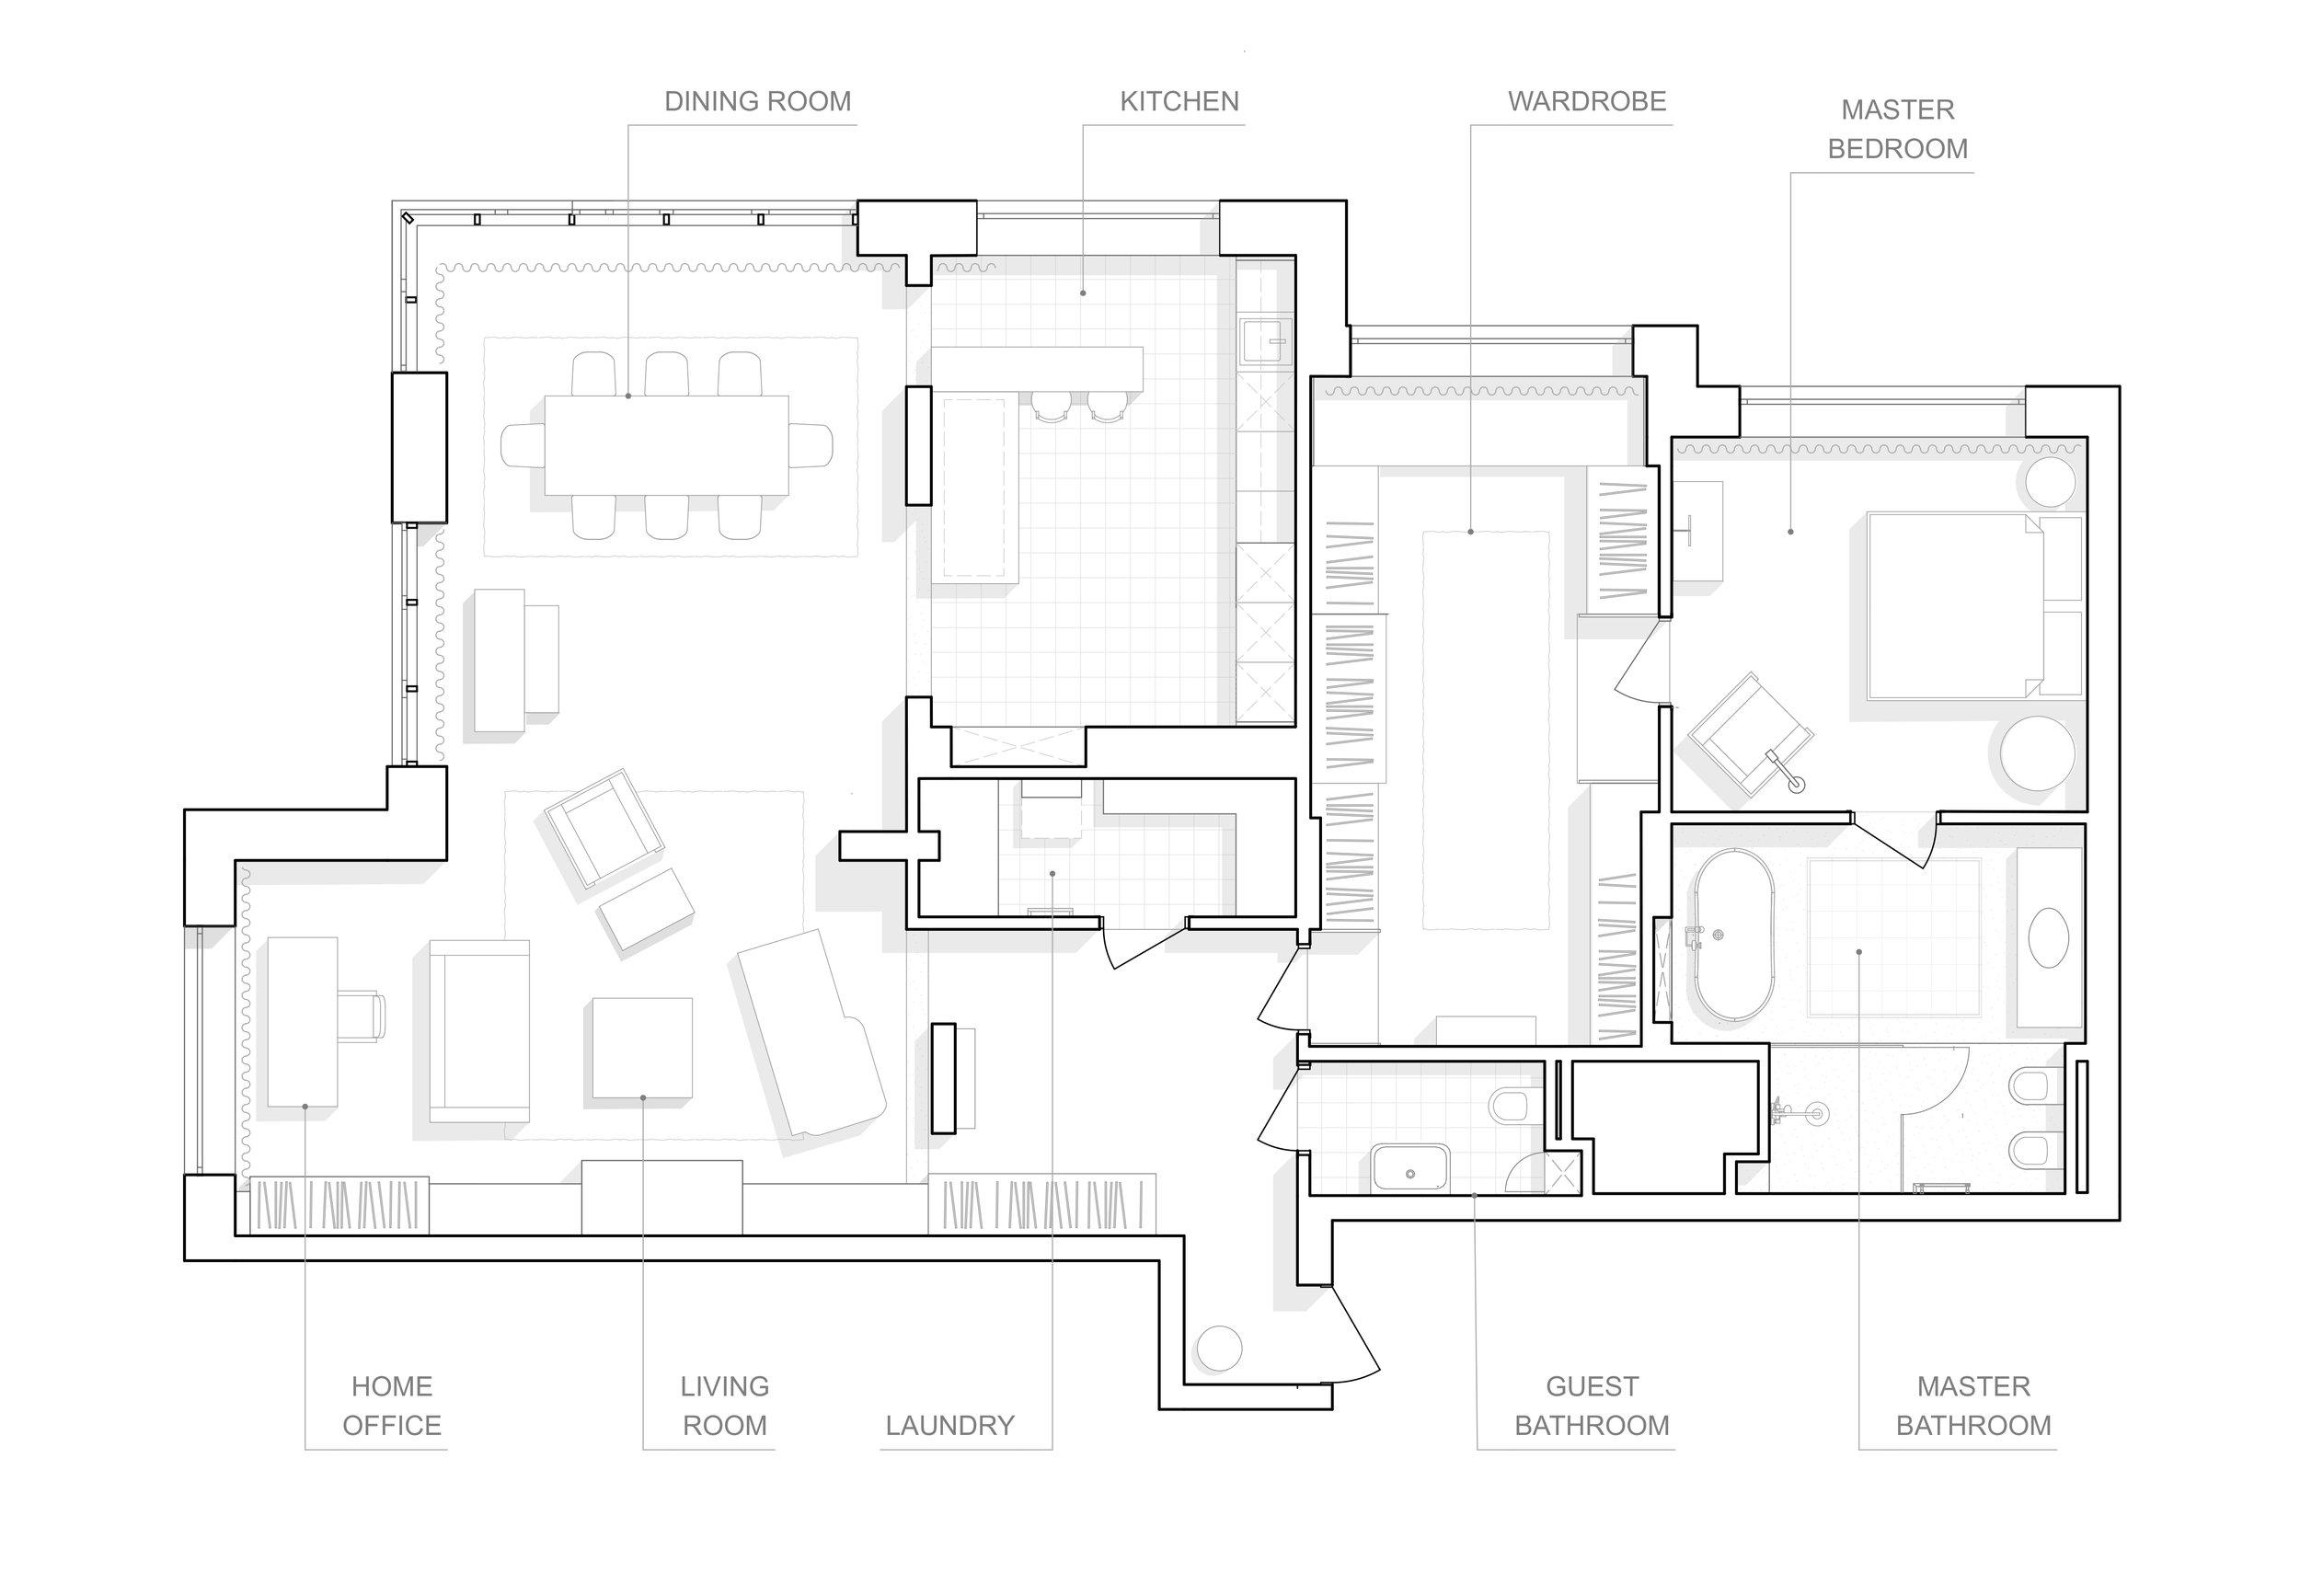 29th Apartment_drawing.jpg